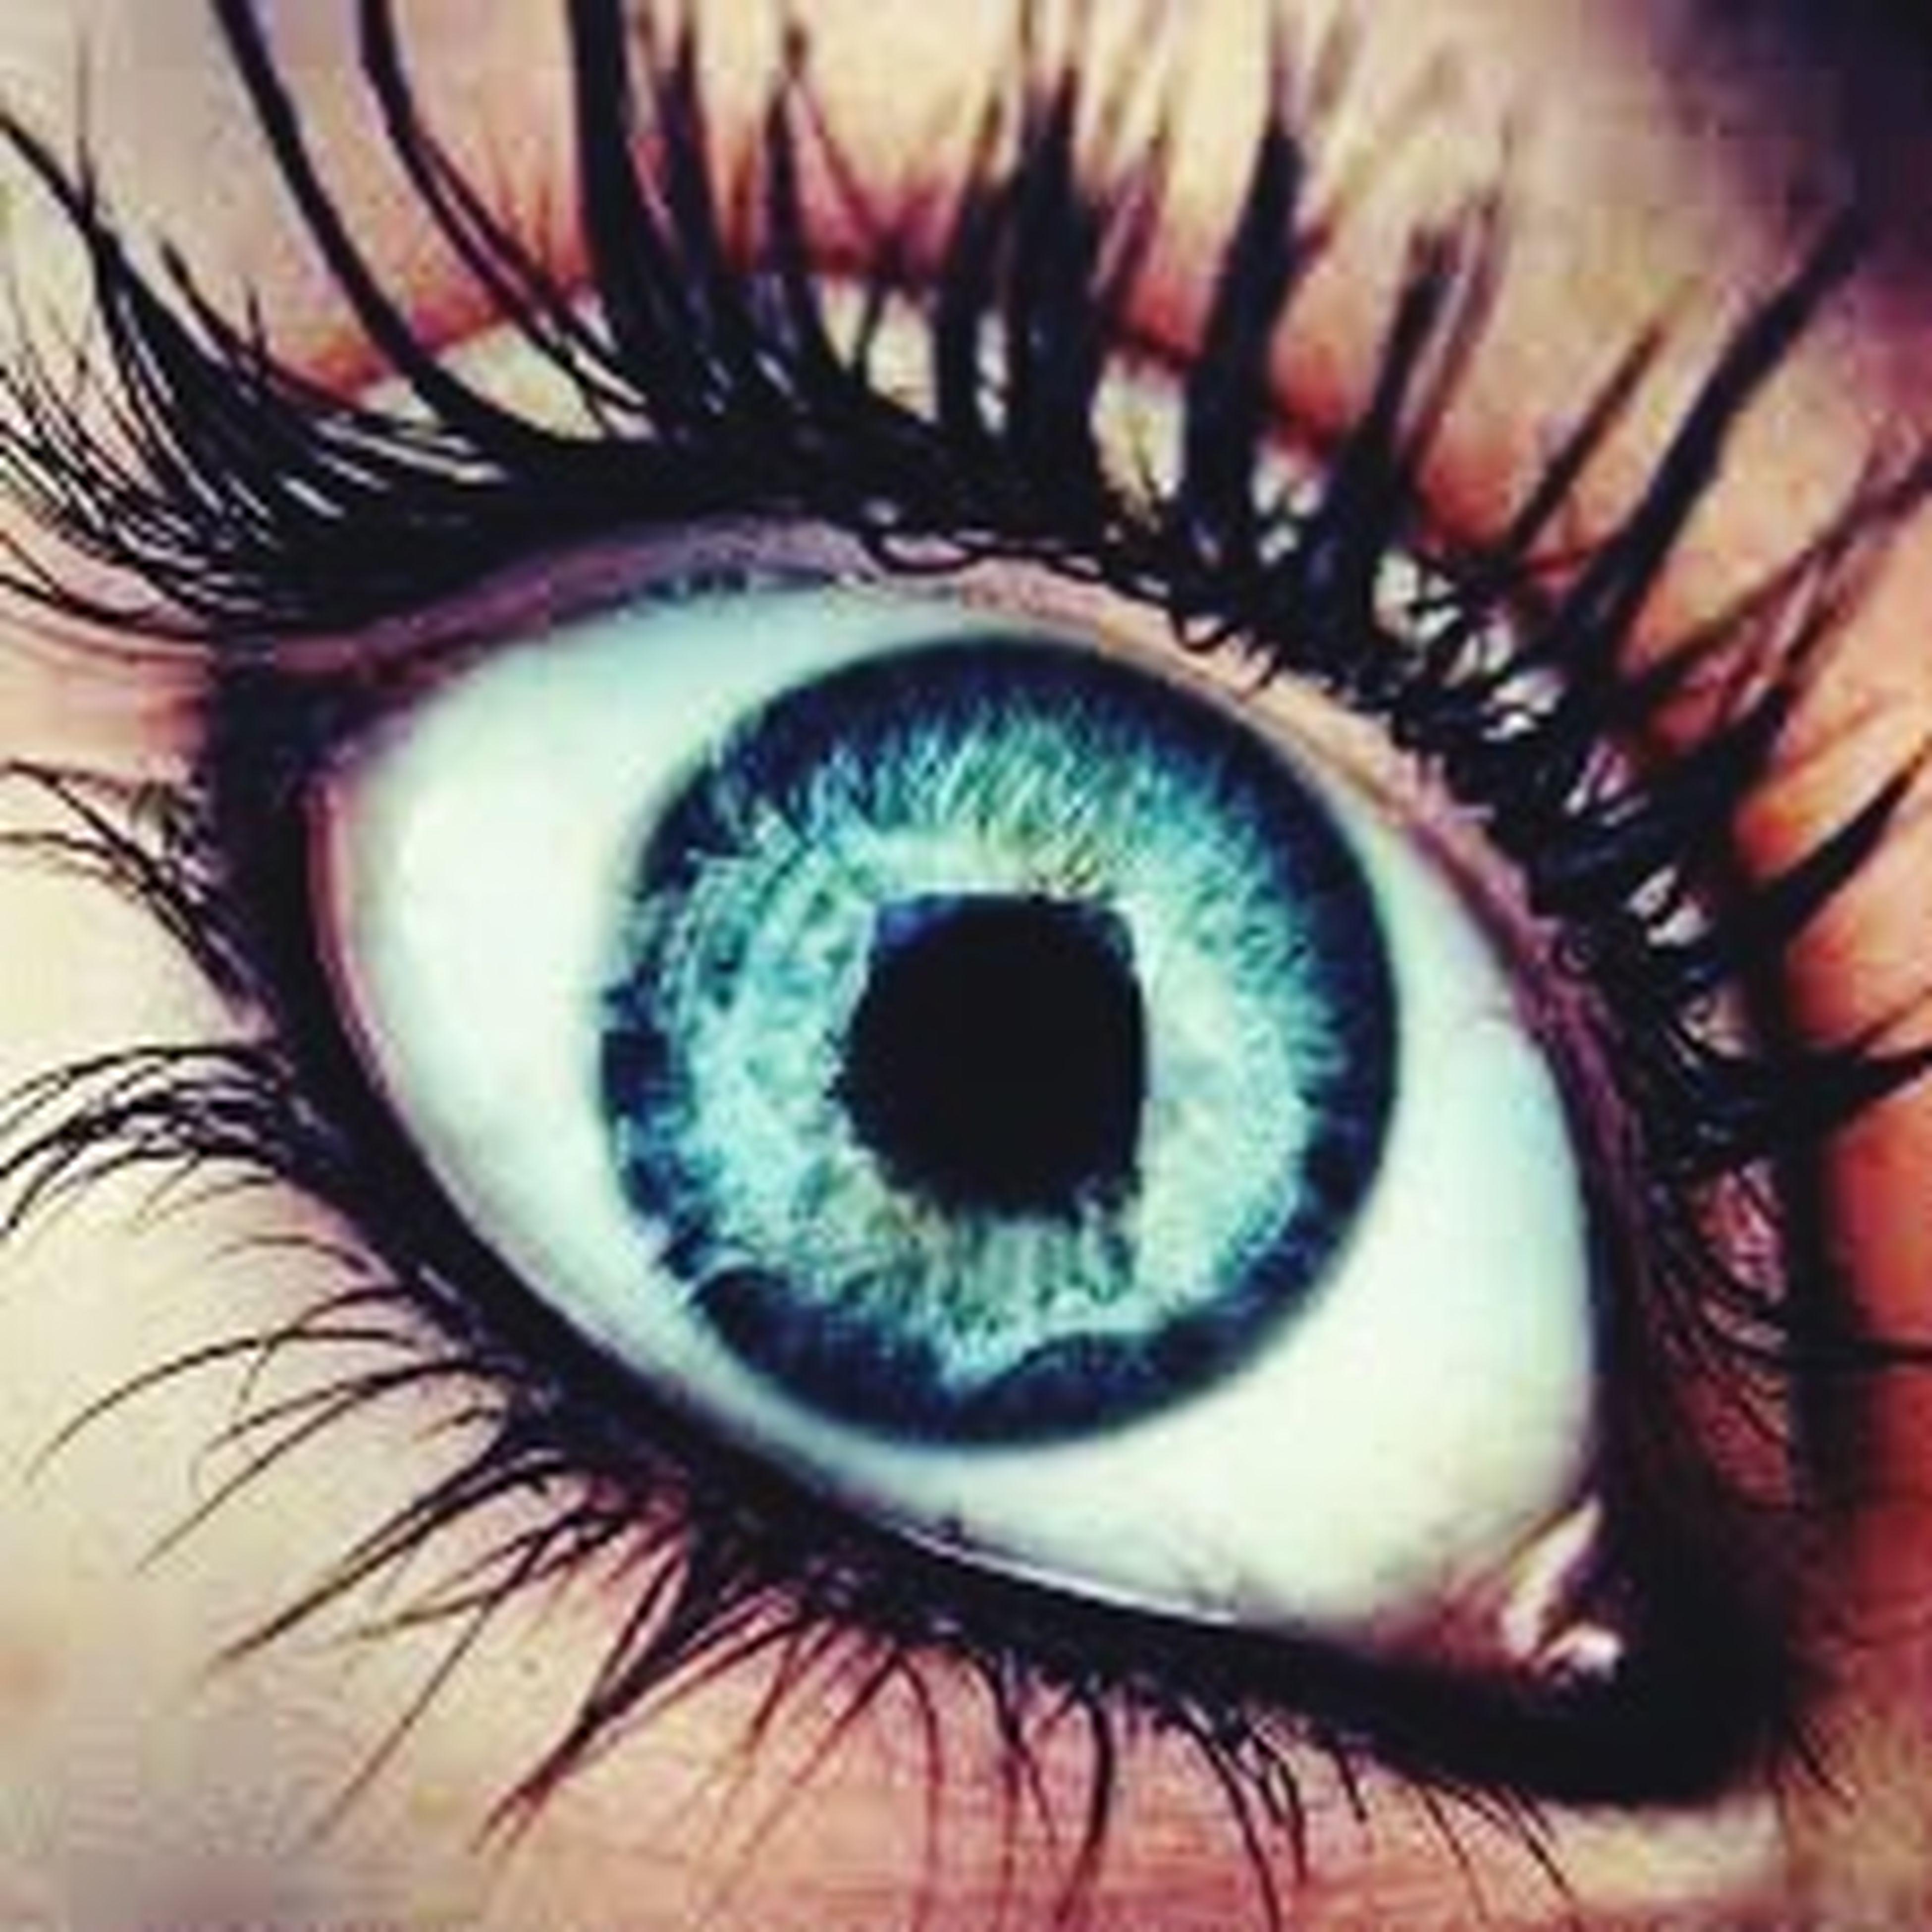 human eye, eyelash, eyesight, close-up, sensory perception, iris - eye, part of, eyeball, extreme close-up, extreme close up, unrecognizable person, full frame, human skin, person, macro, looking at camera, indoors